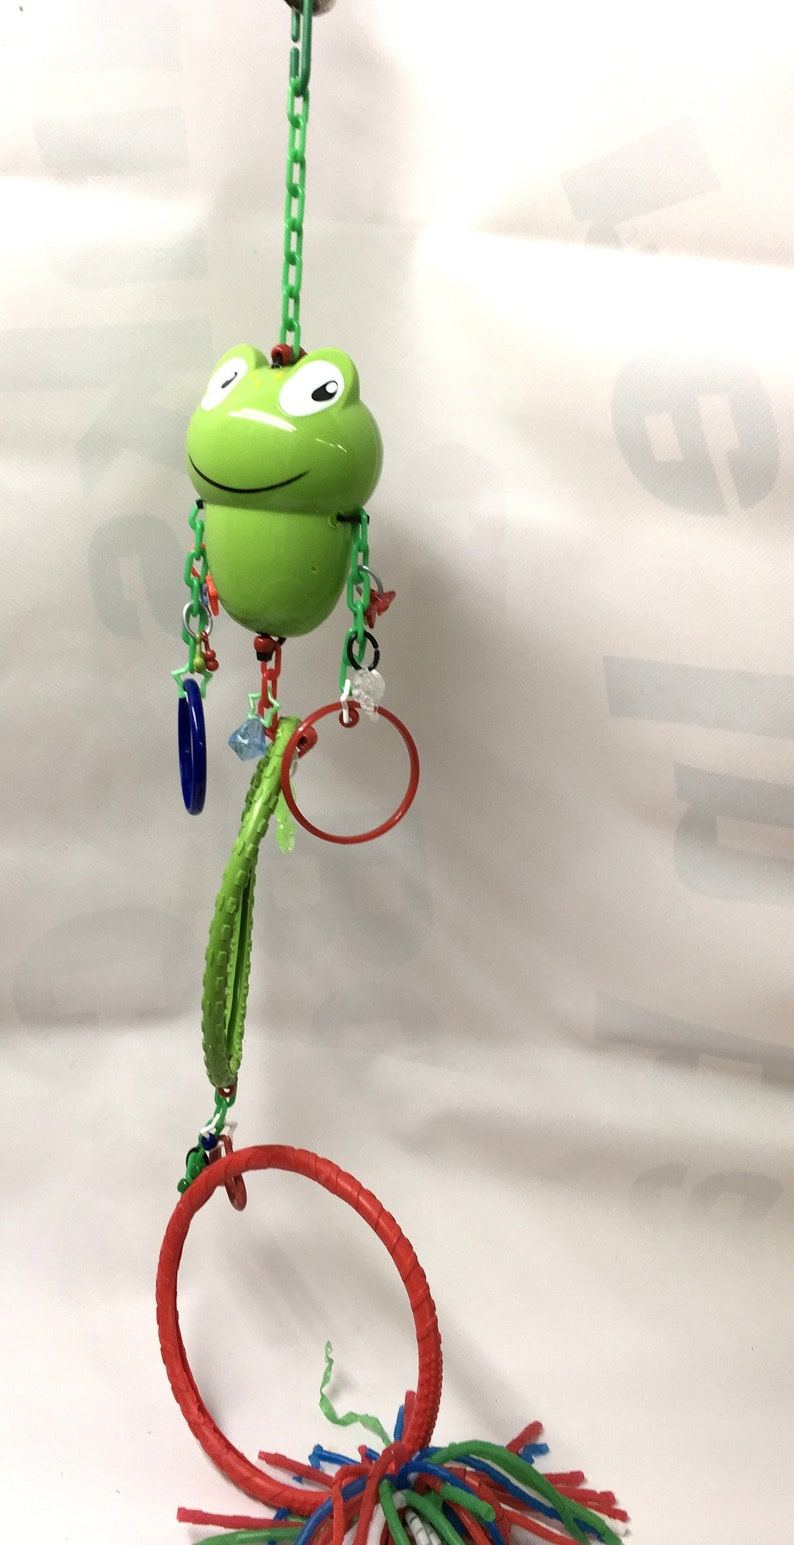 Sugar Glider Frog Dual Circle toy